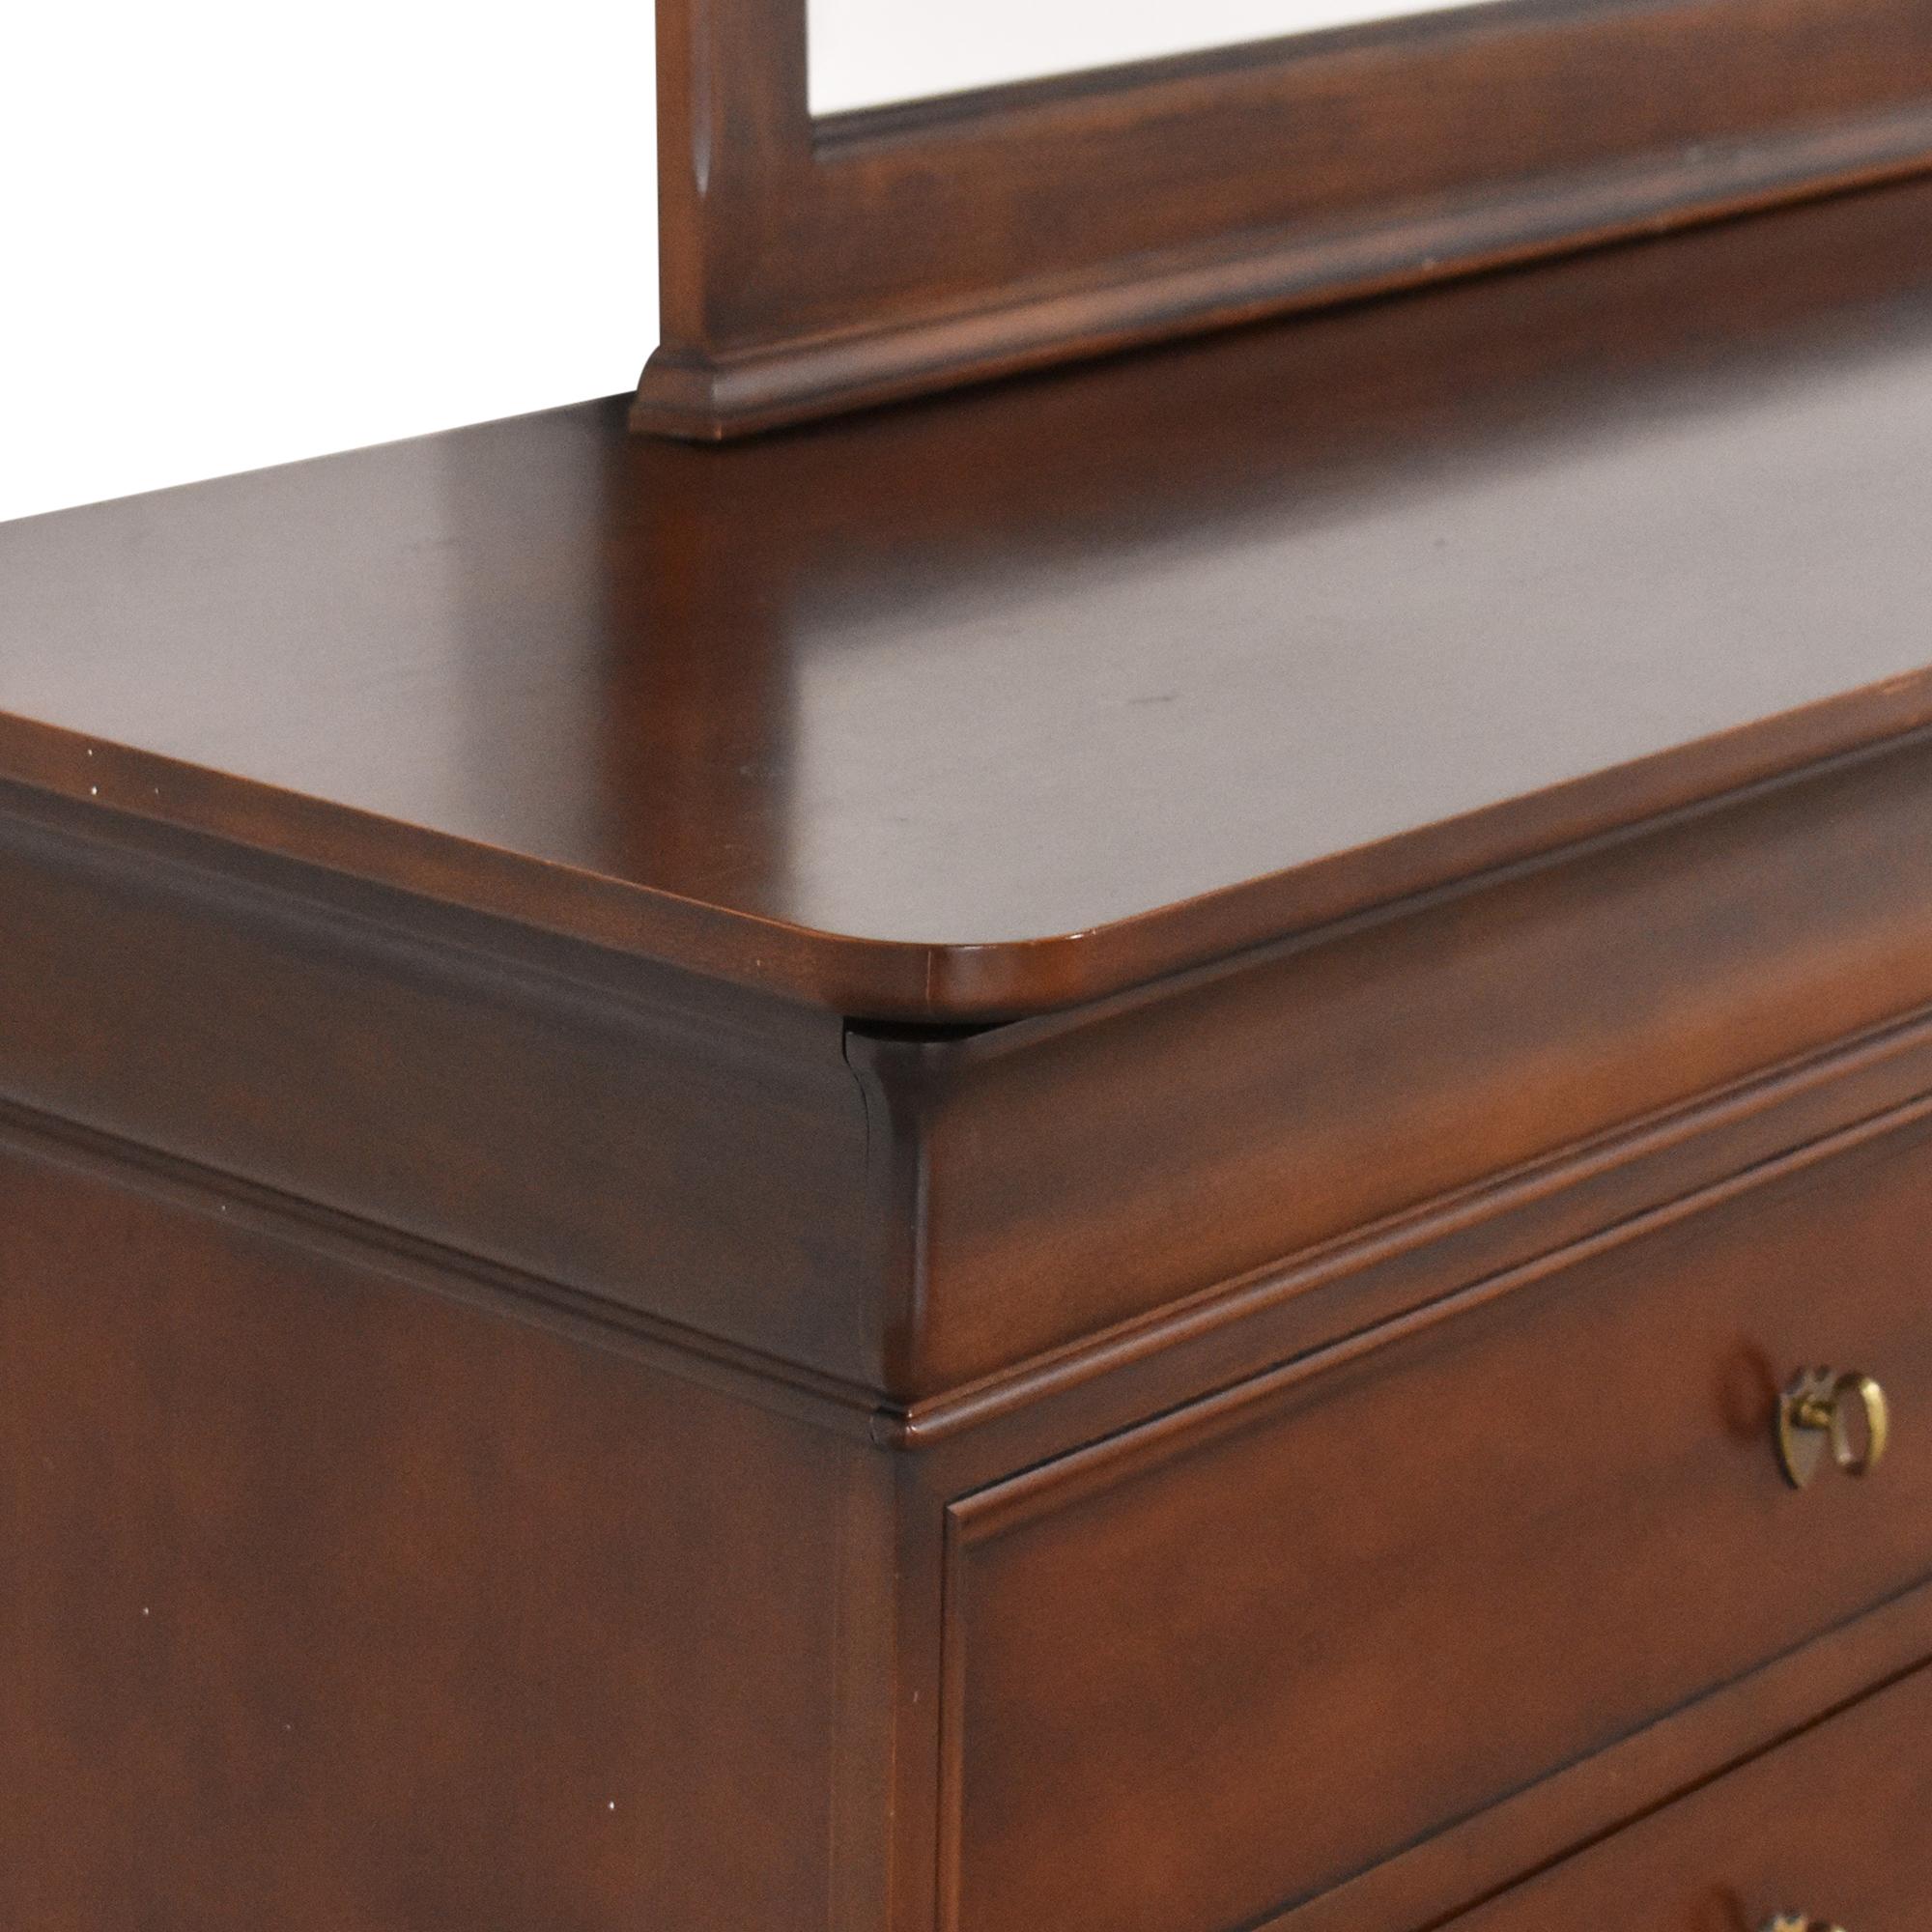 Kimball Kimball Double Dresser with Mirror used